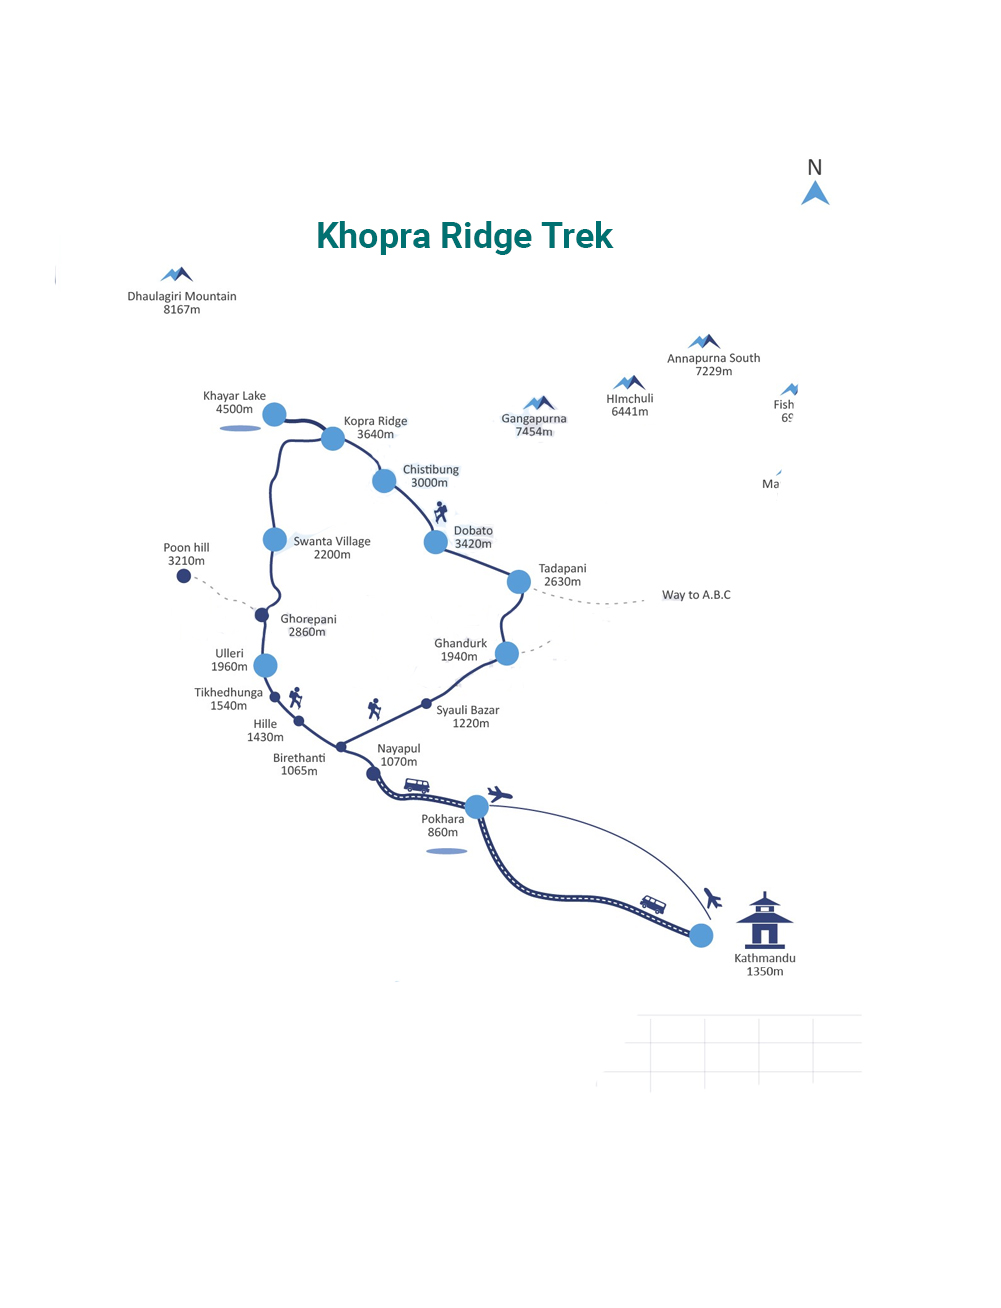 Khopra ridge trek map